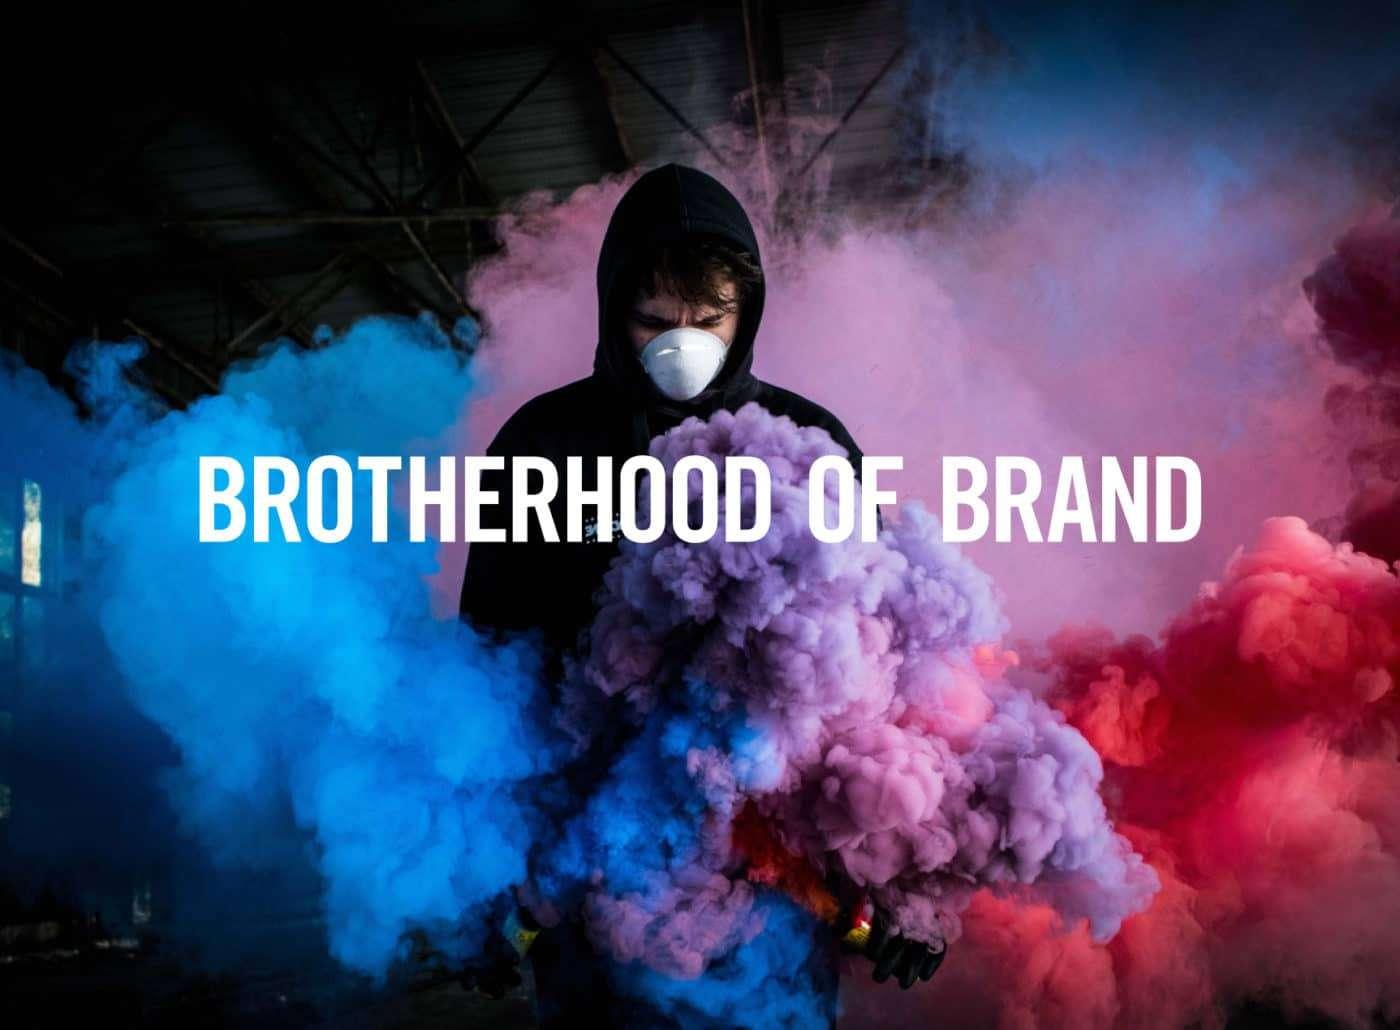 Brotherhood of Brand logo by TAC